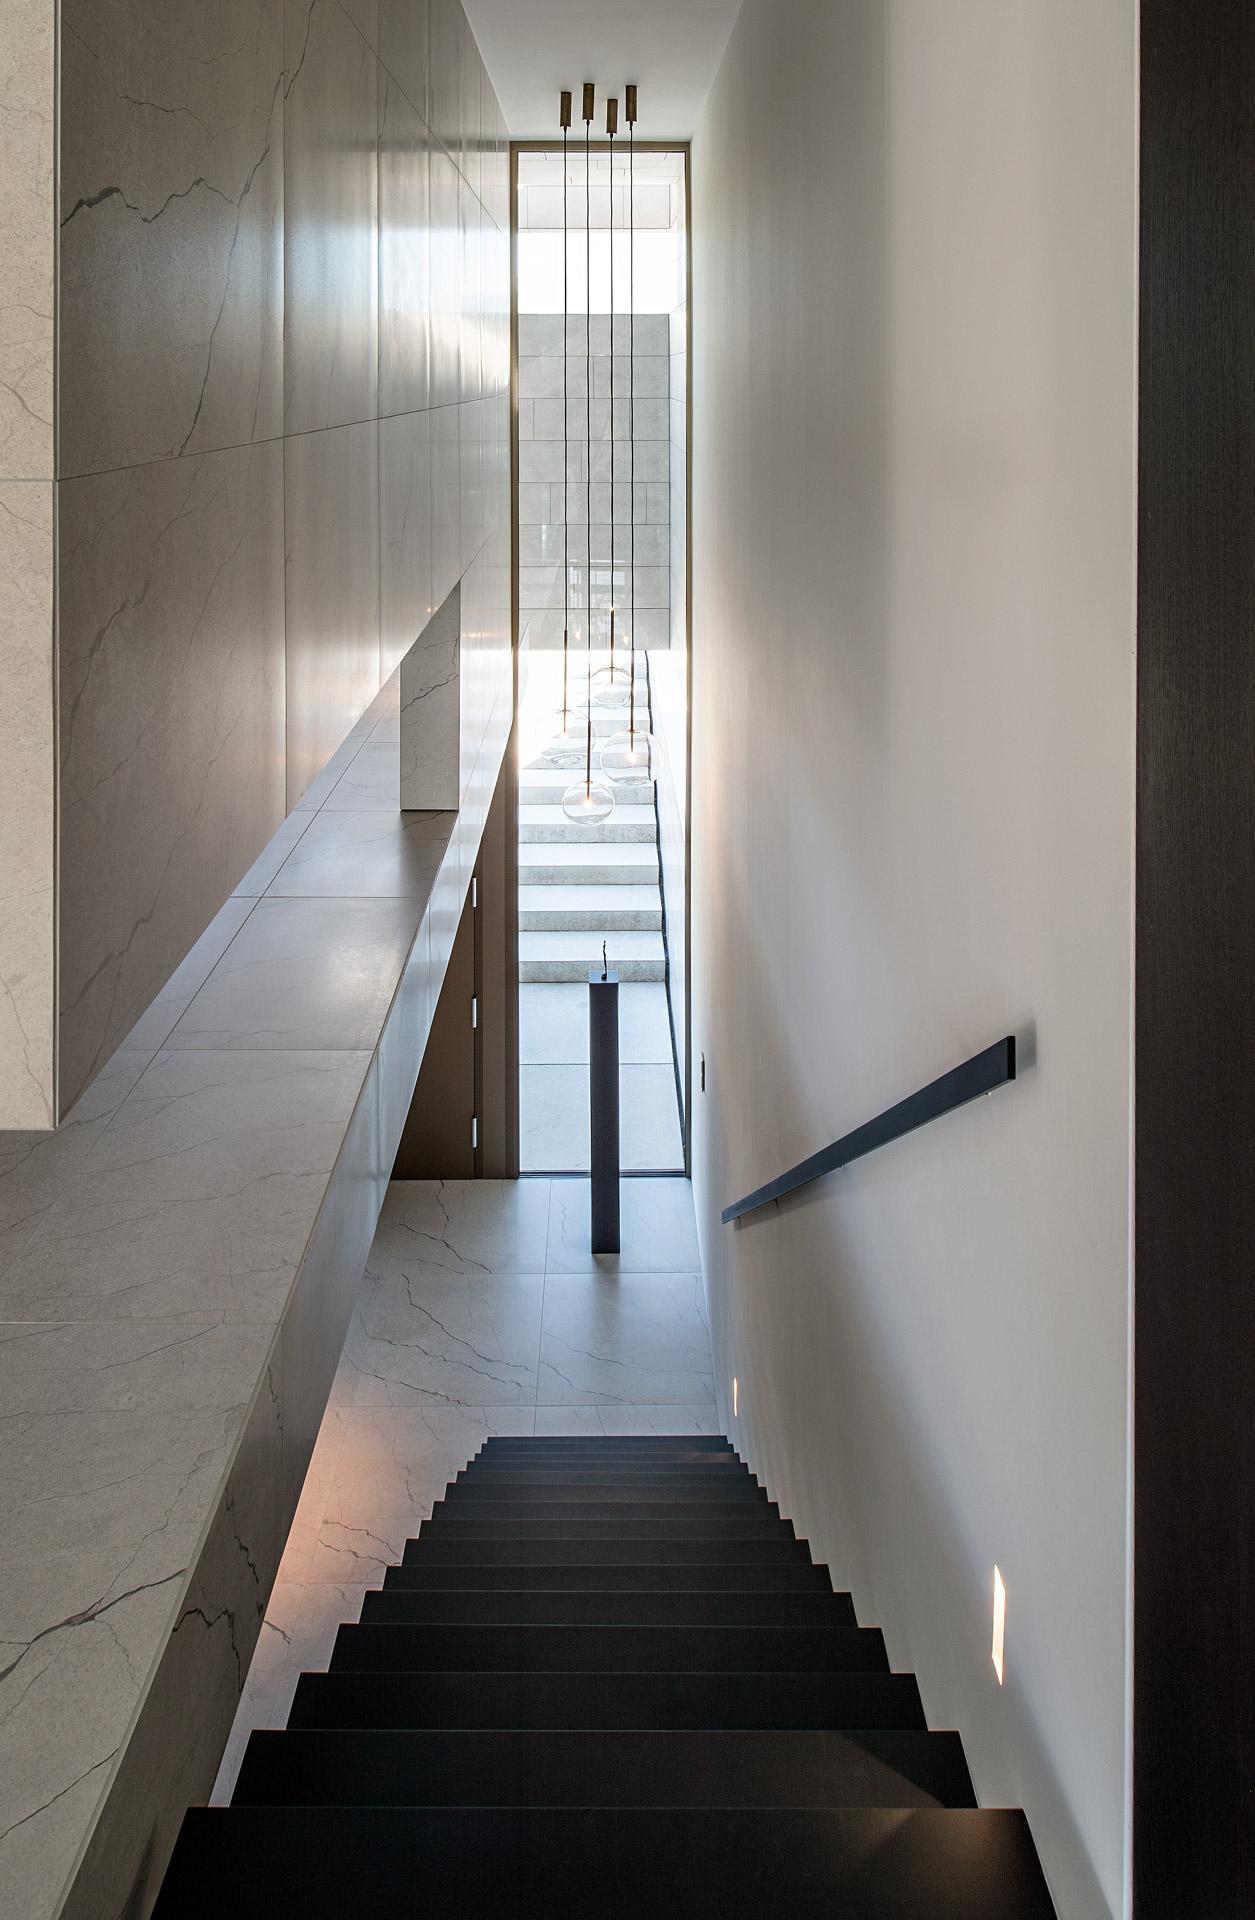 Objekt Bünck: Treppenaufgang. Foto: Dr. Klaus Schörner